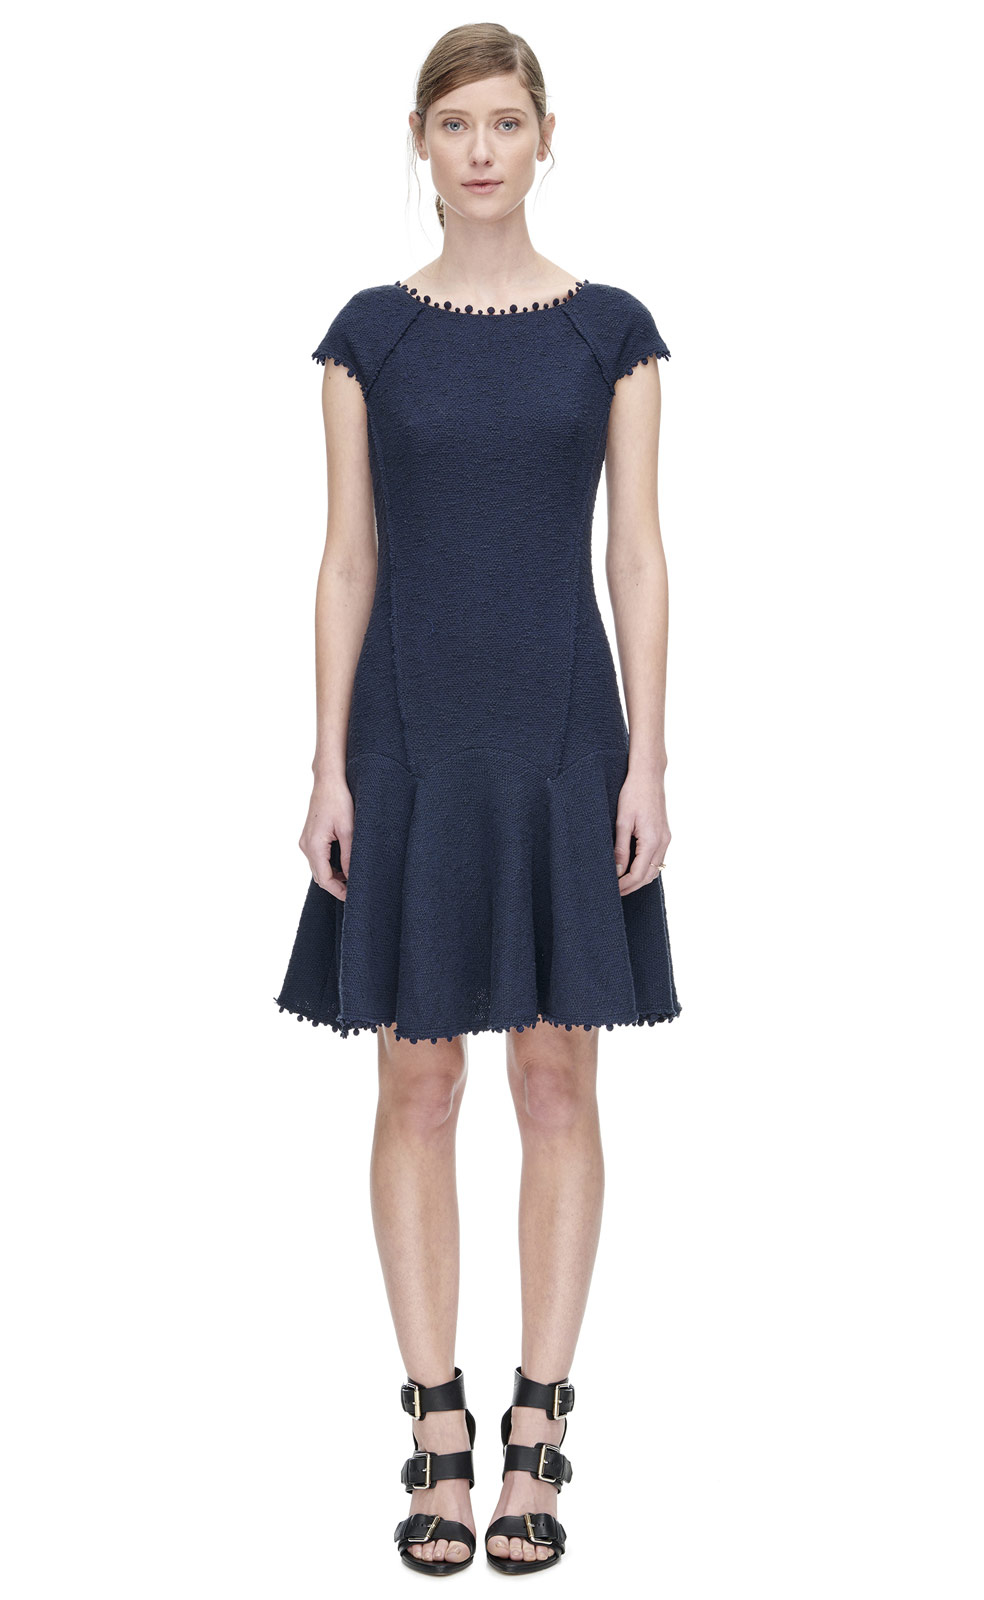 REBECCA TAYLOR Zadie Fleur Short Smock Waist Dress - We